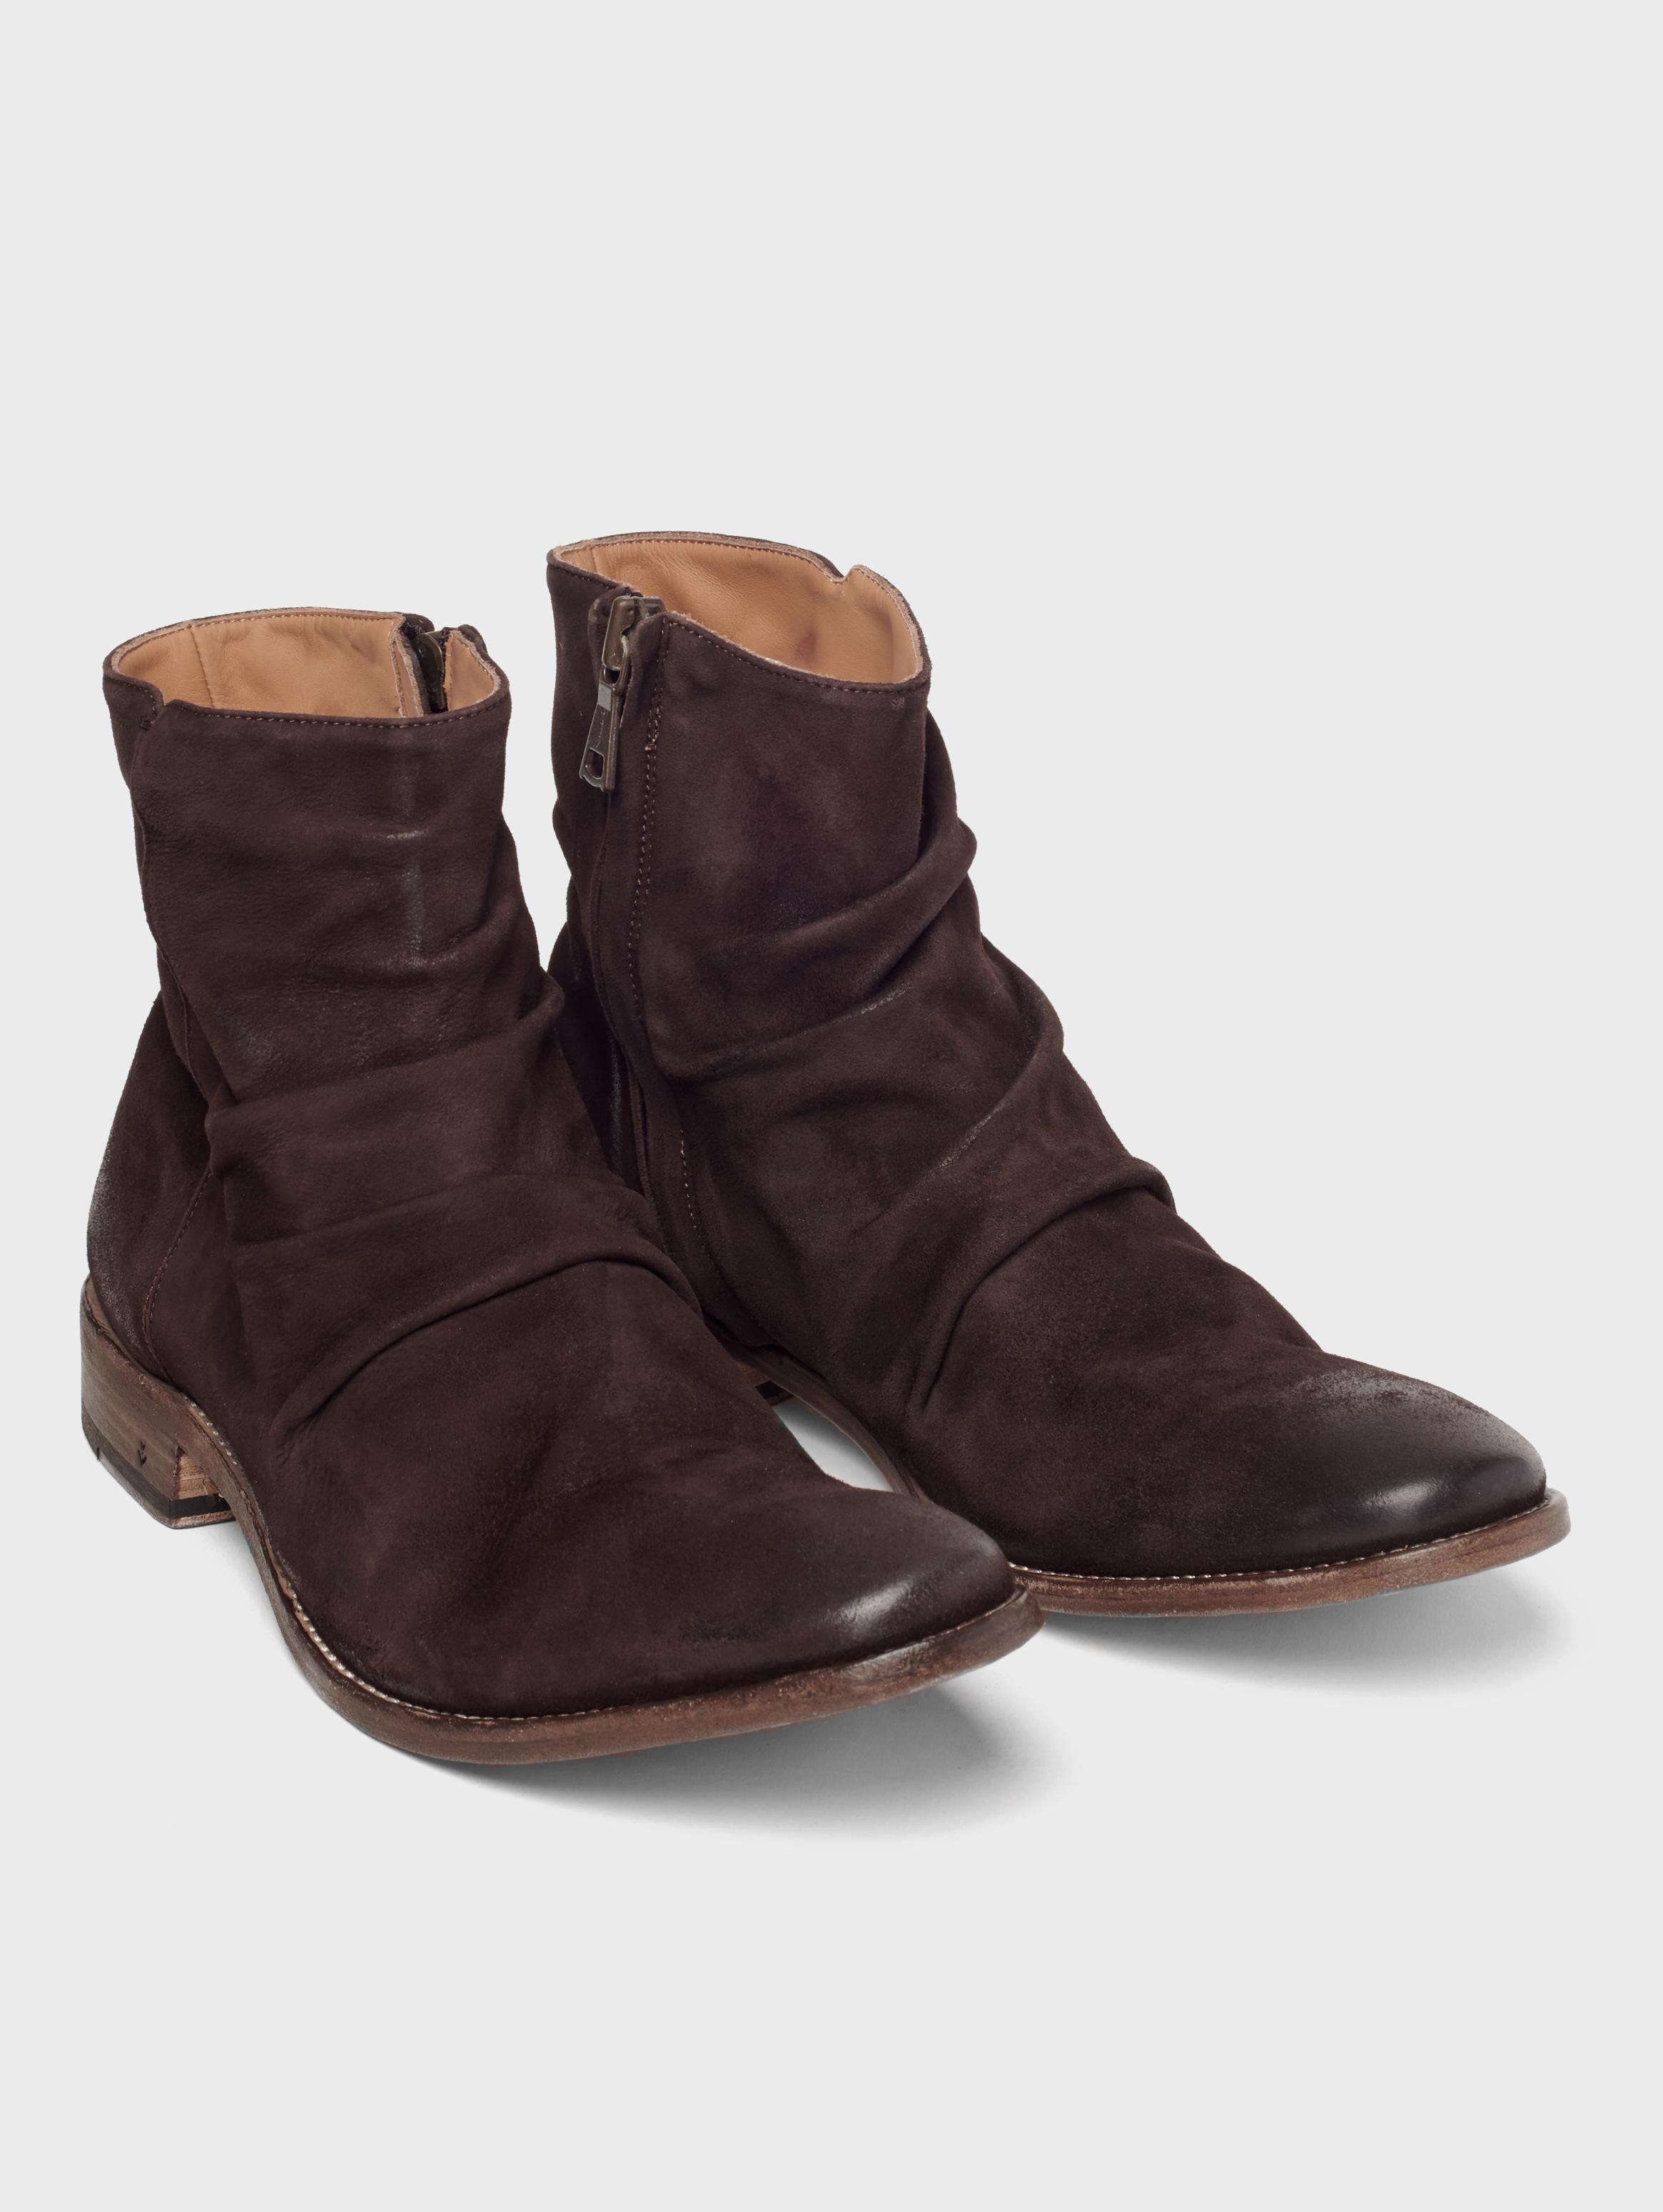 John Varvatos Morrison Sharpei Boots Chocolate